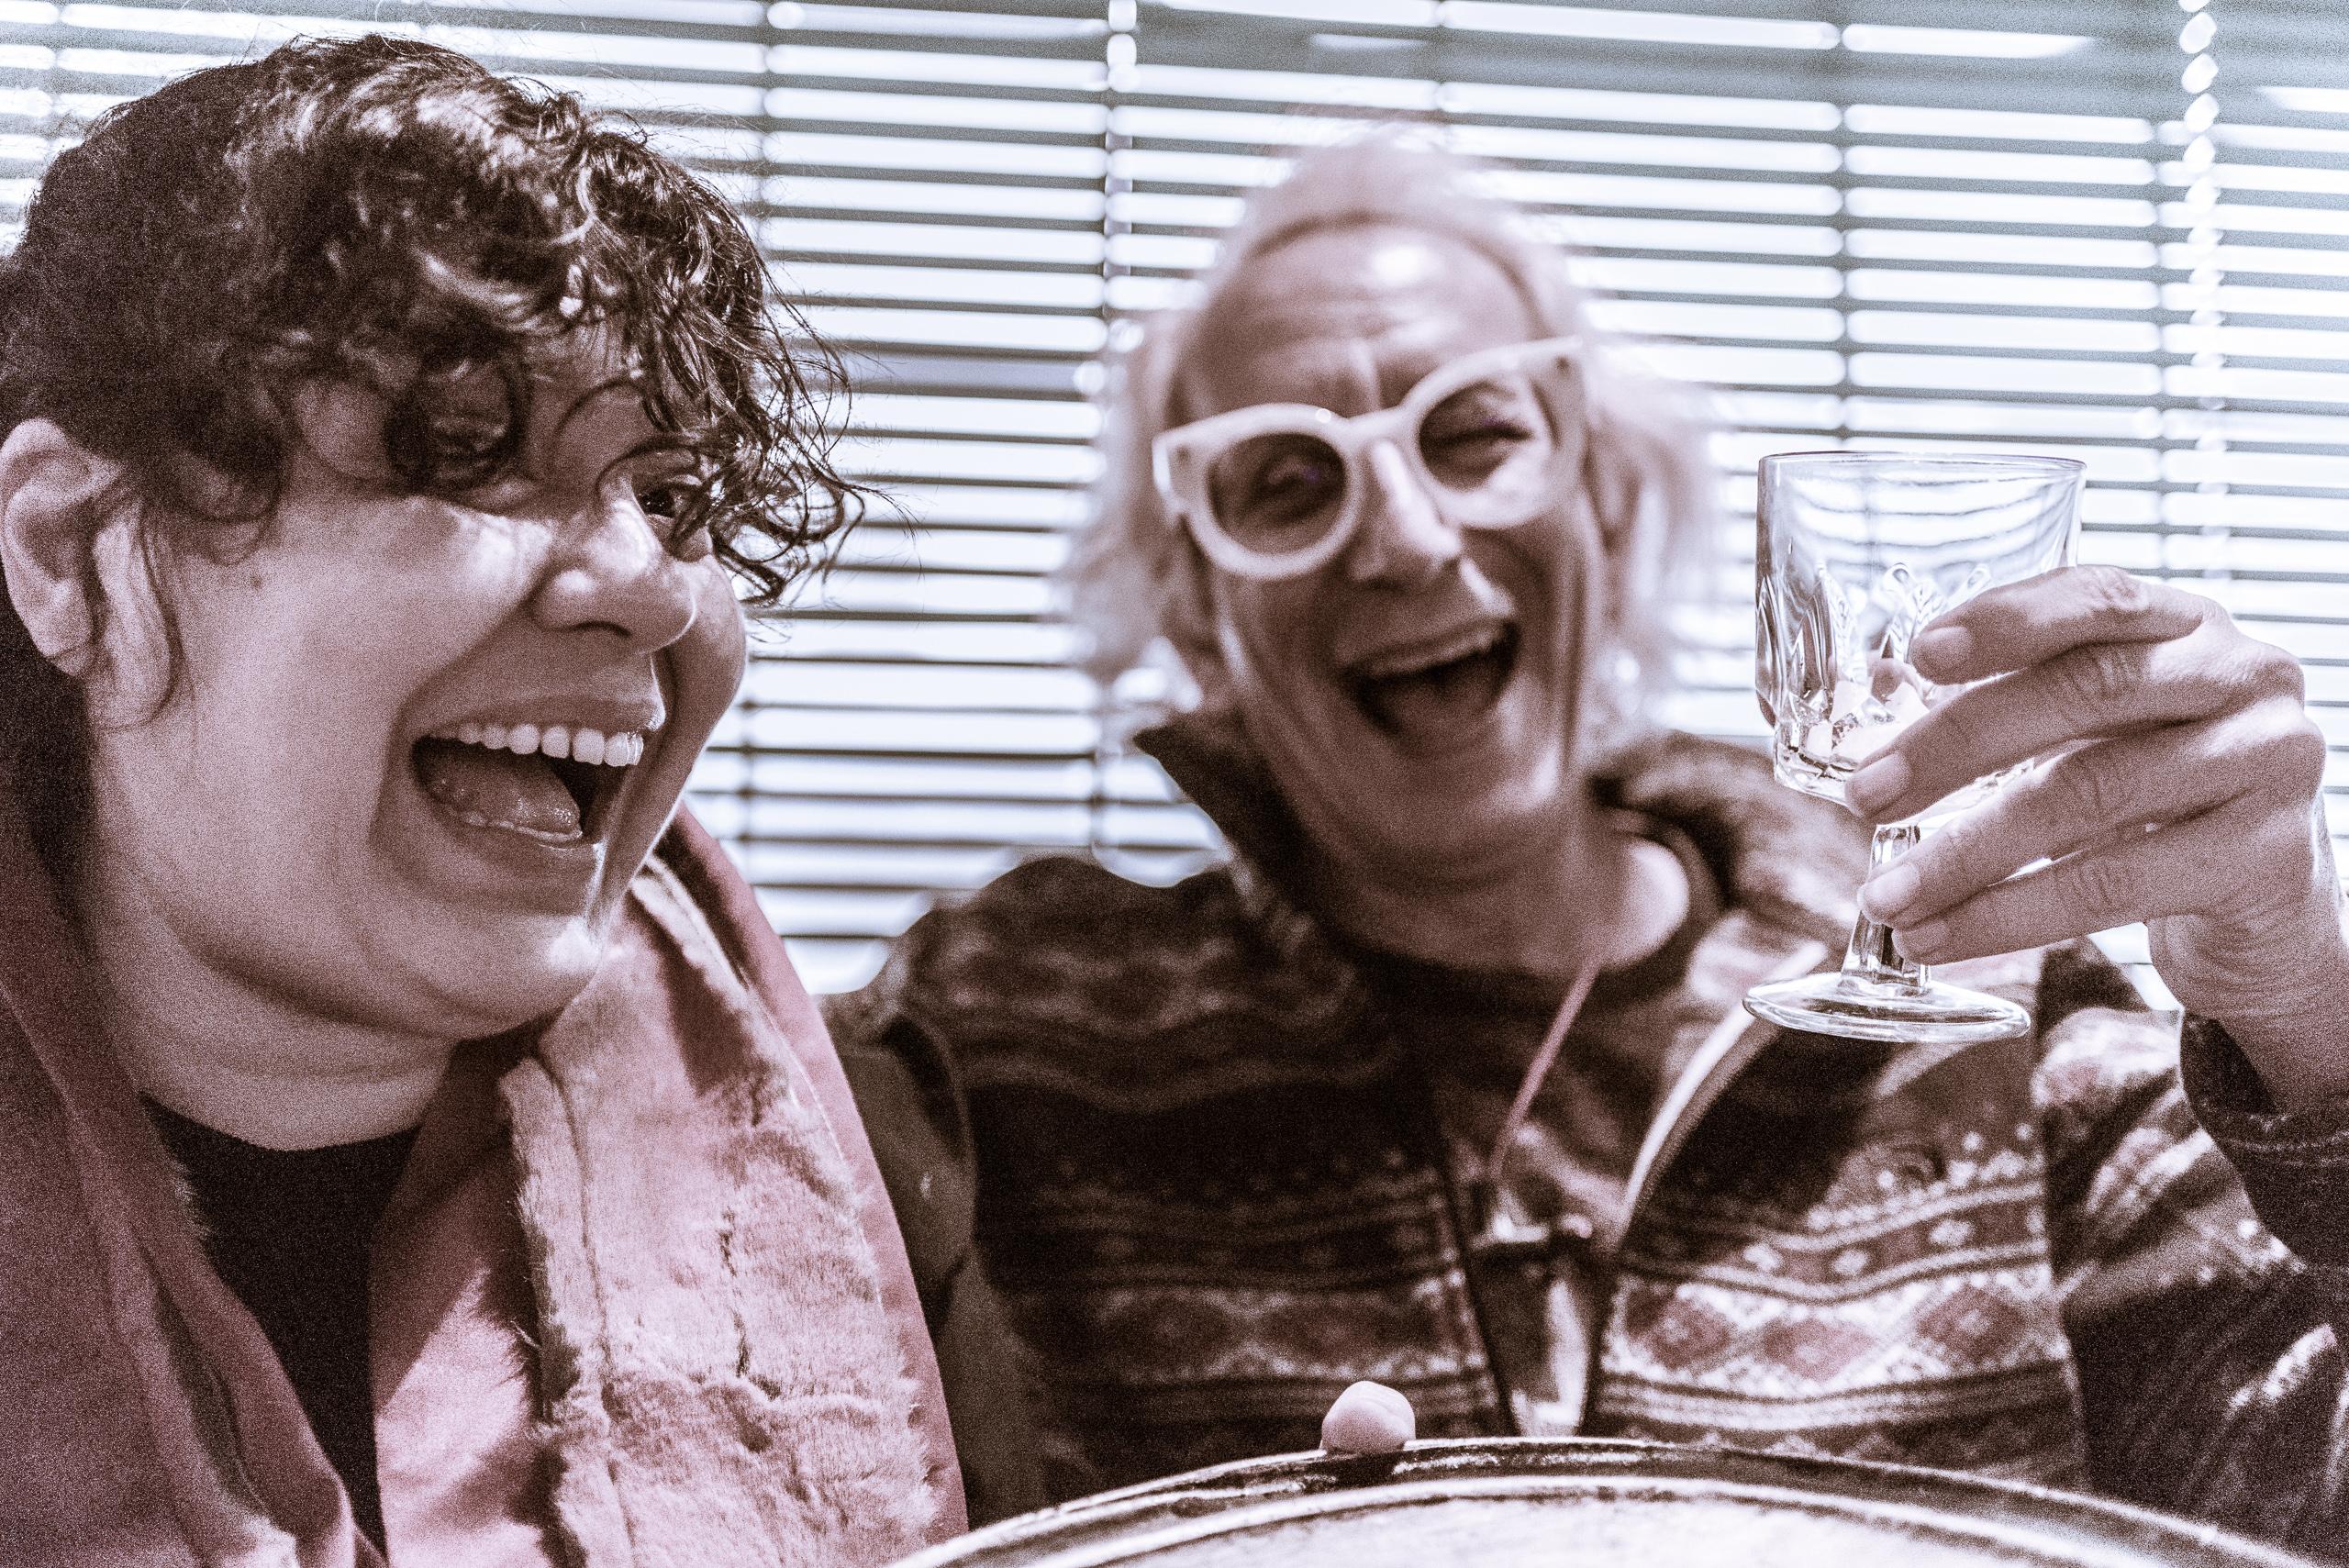 Rae Anne Robinette & Glenn Zucman having a Caesar salad & pizza lunch at Miceli's in Hollywood